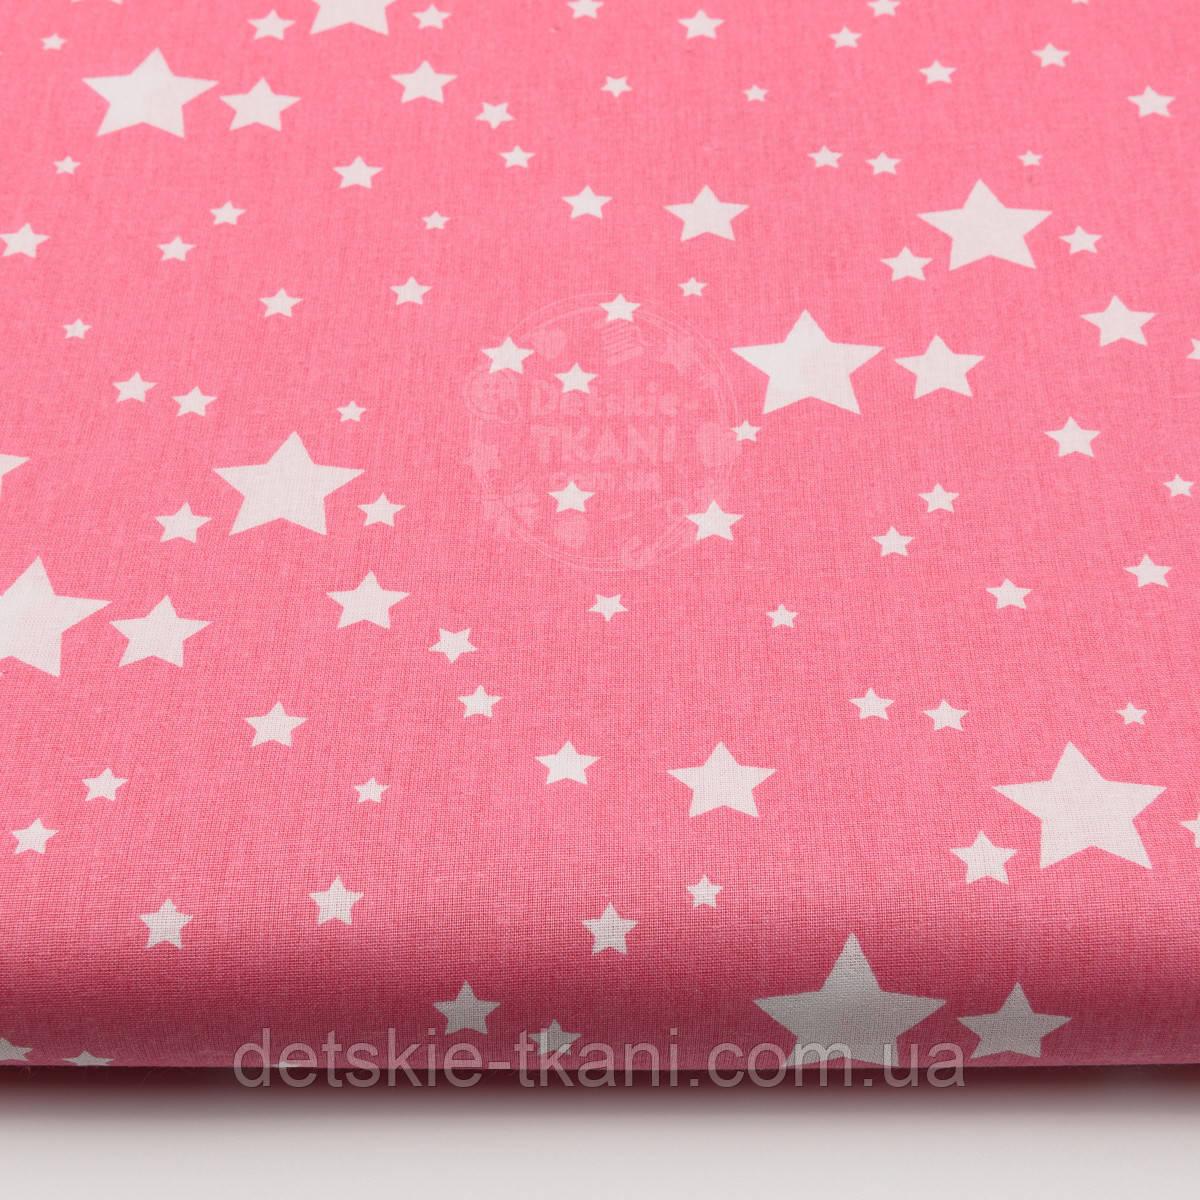 "Ткань хлопковая ""Мини галактика"" белая на тёмно-розовом (№ 1458)"